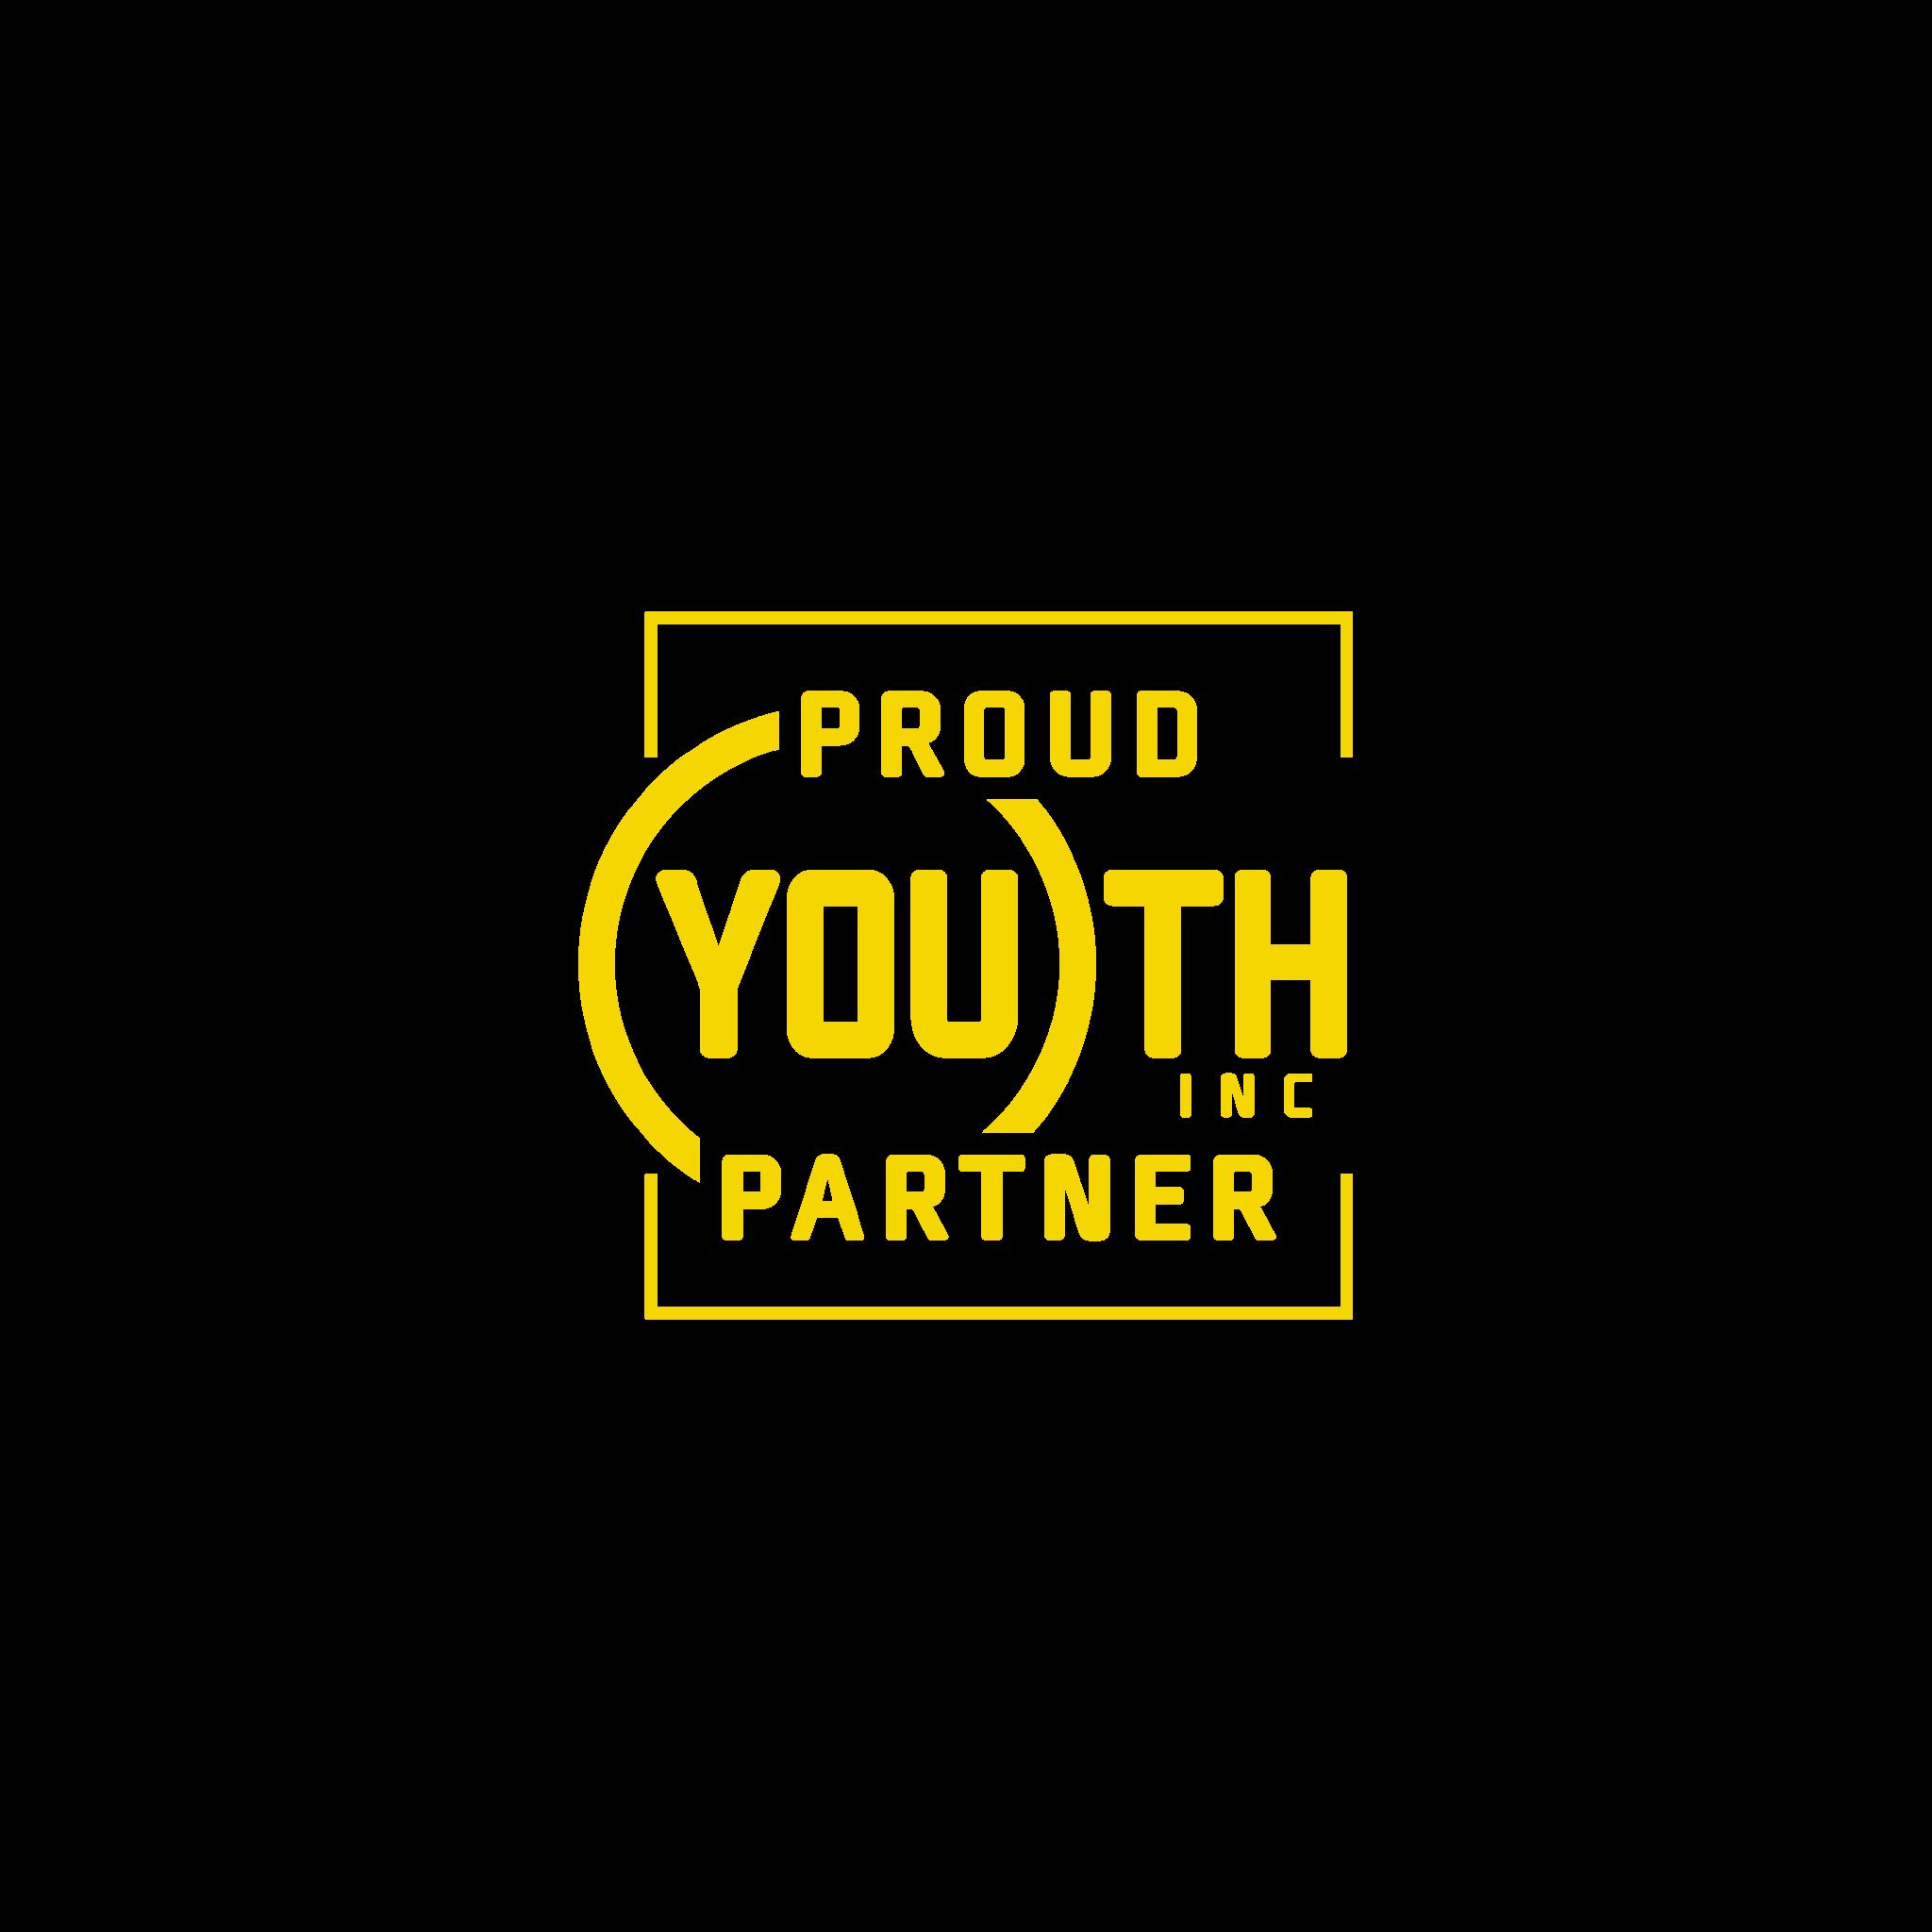 Youth INC Proud Partner Yellow (002)